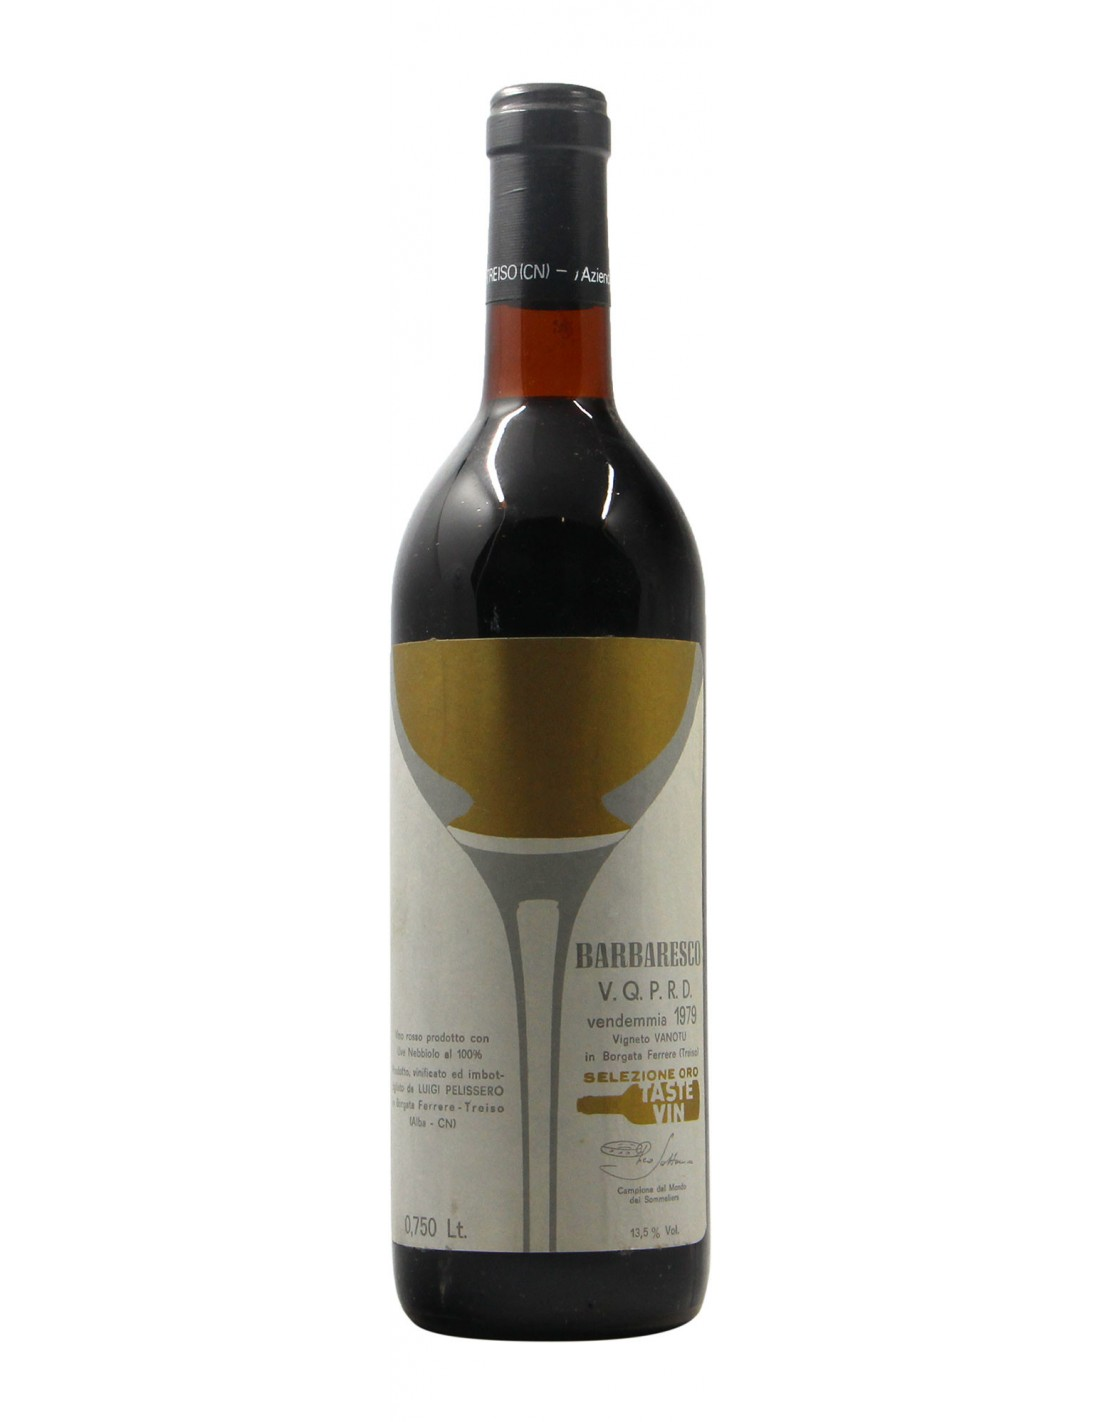 BARBARESCO VANOTU 1979 PELISSERO Grandi Bottiglie